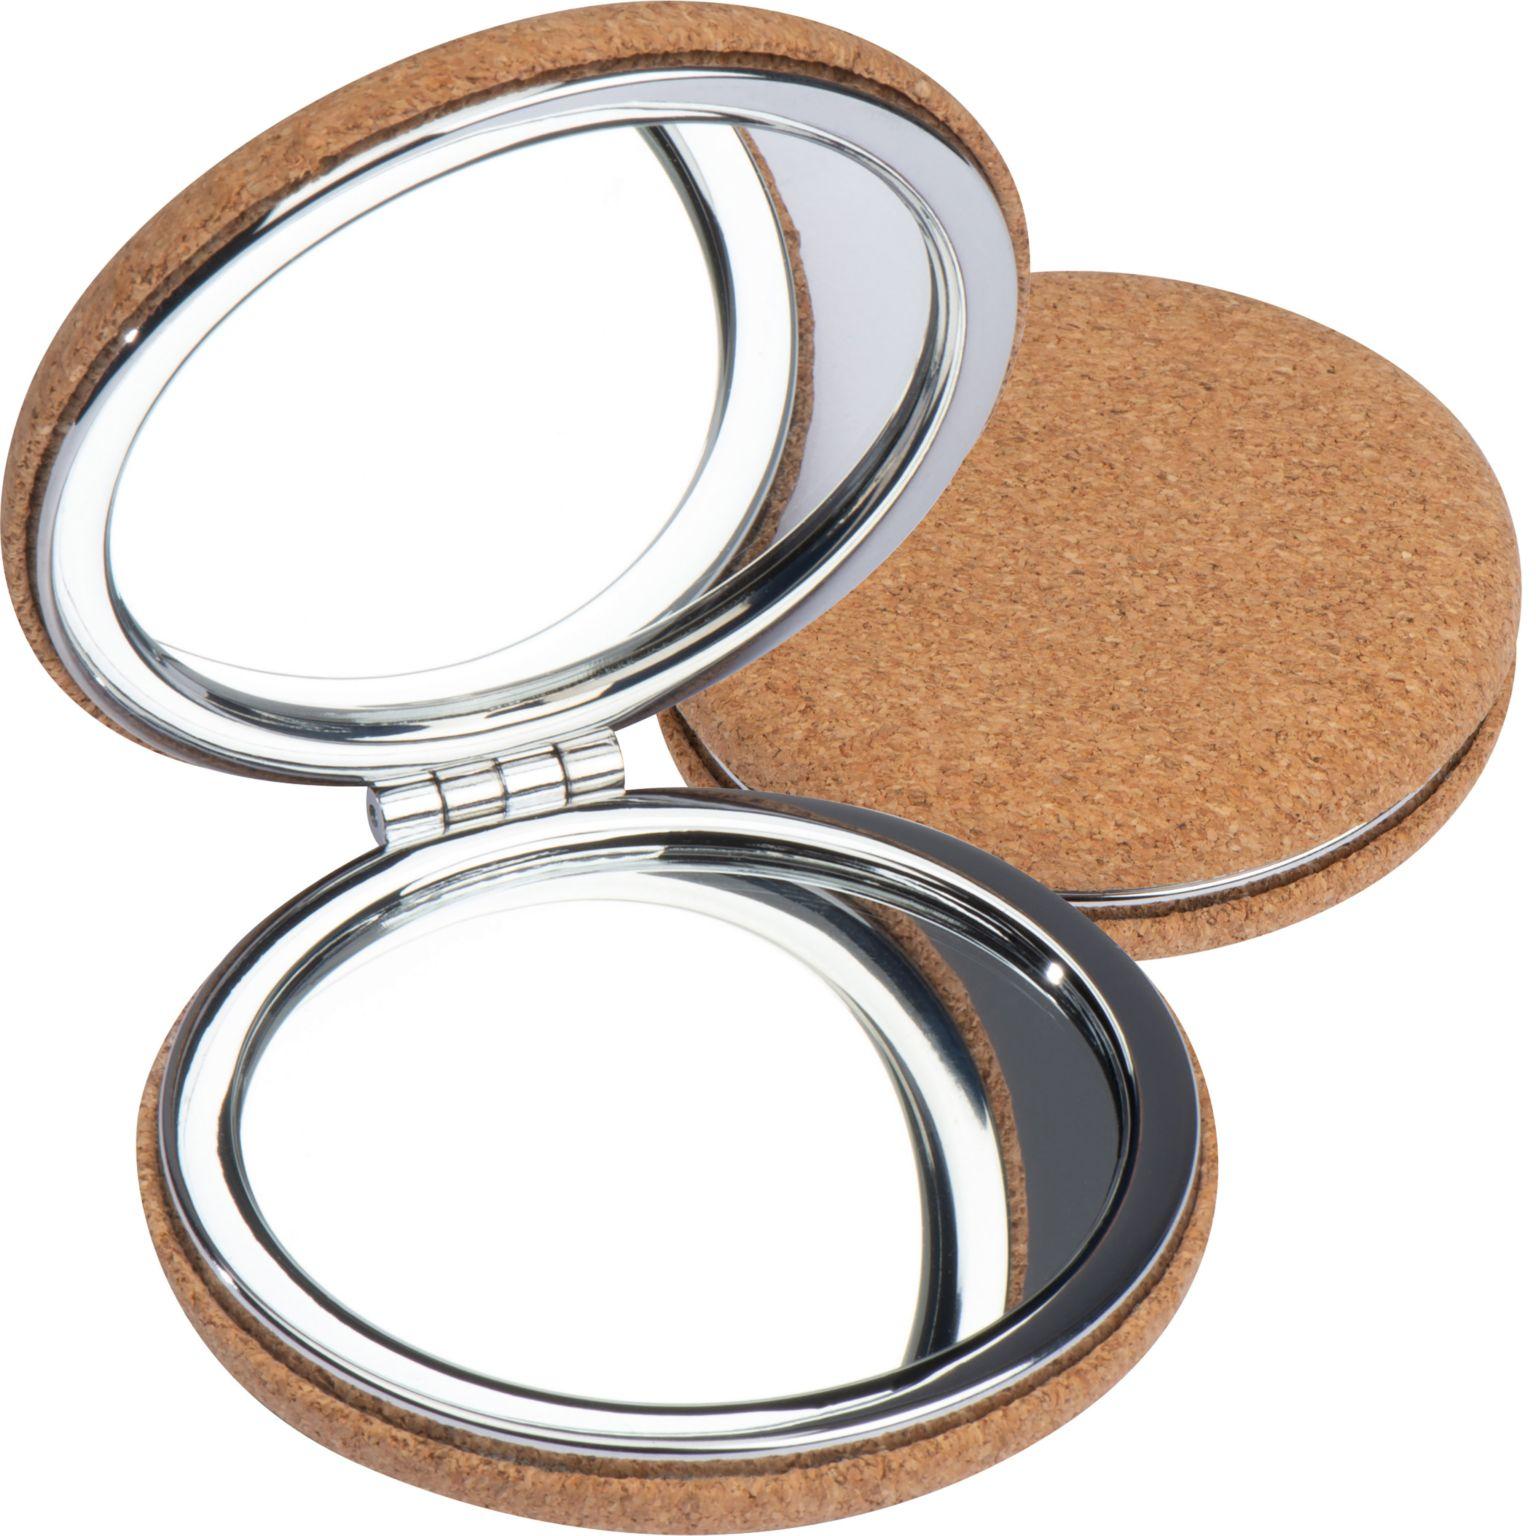 Metal double mirror with cork coating